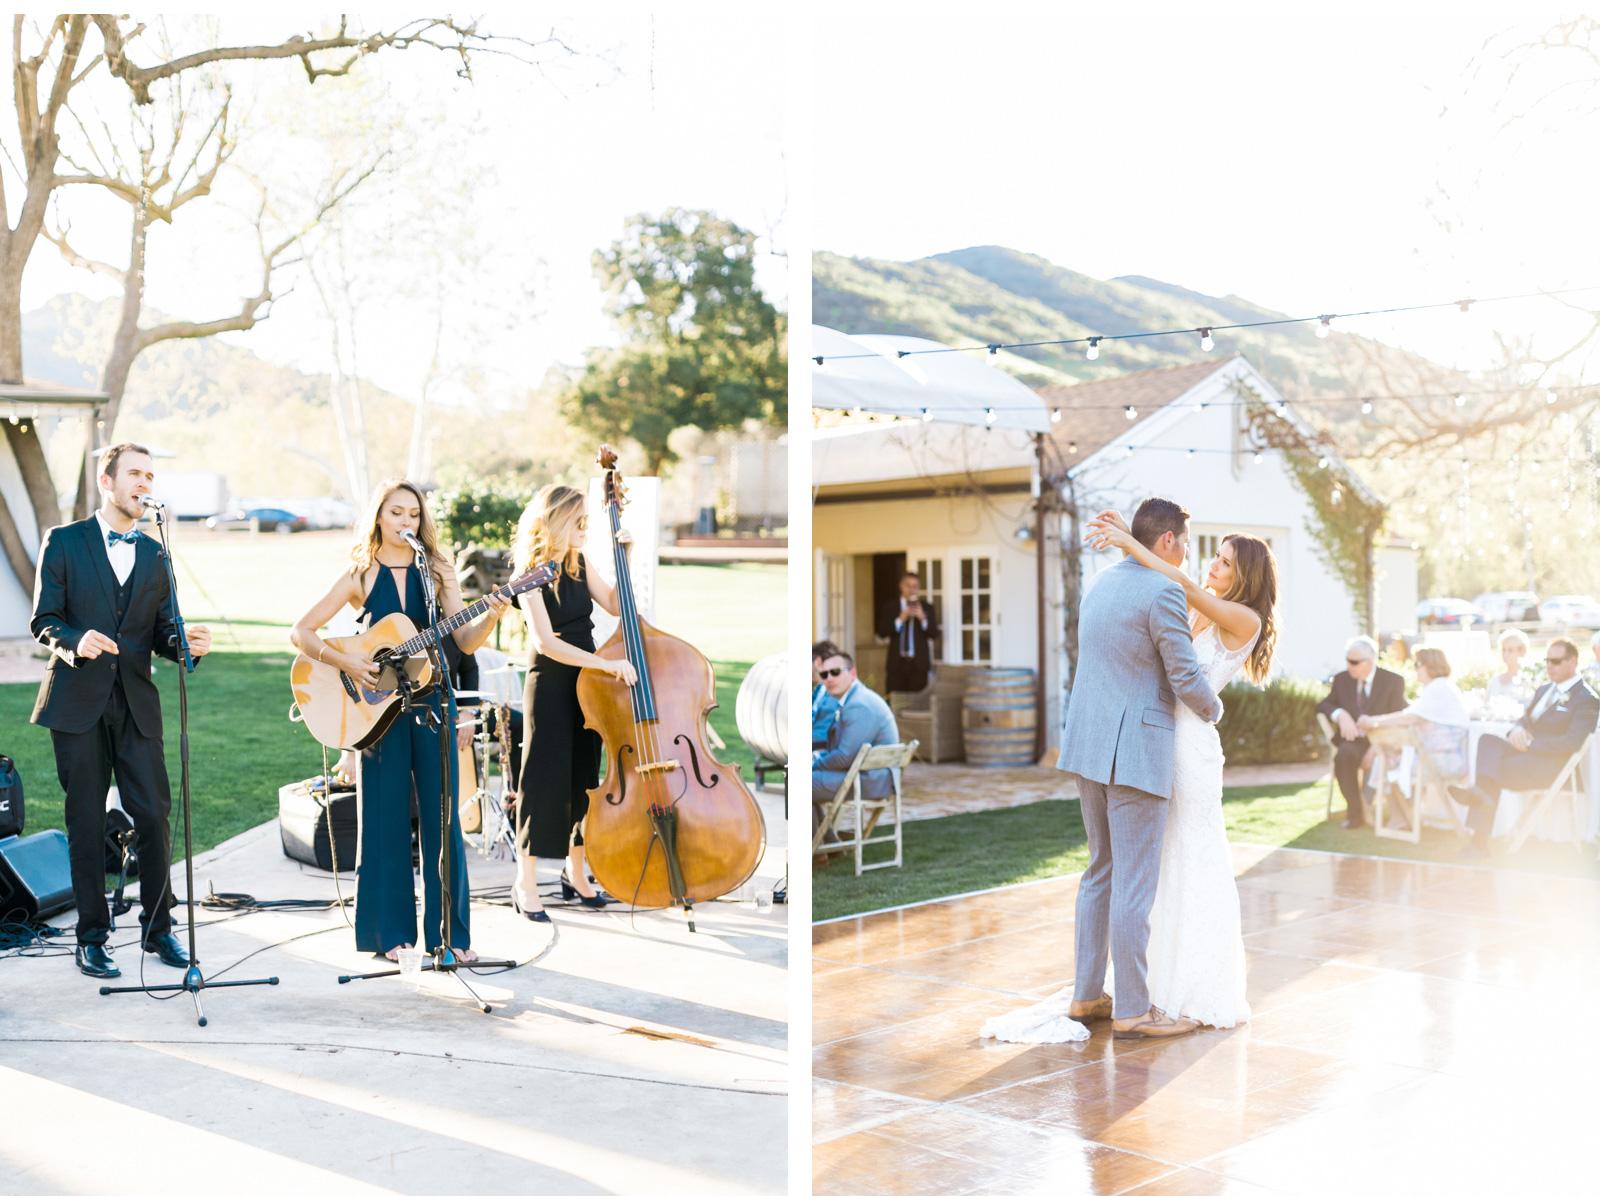 Triunfo-Creek-Saddlerock-Ranch-Wedding-Photographer-Natalie-Schutt-Photography_20.jpg